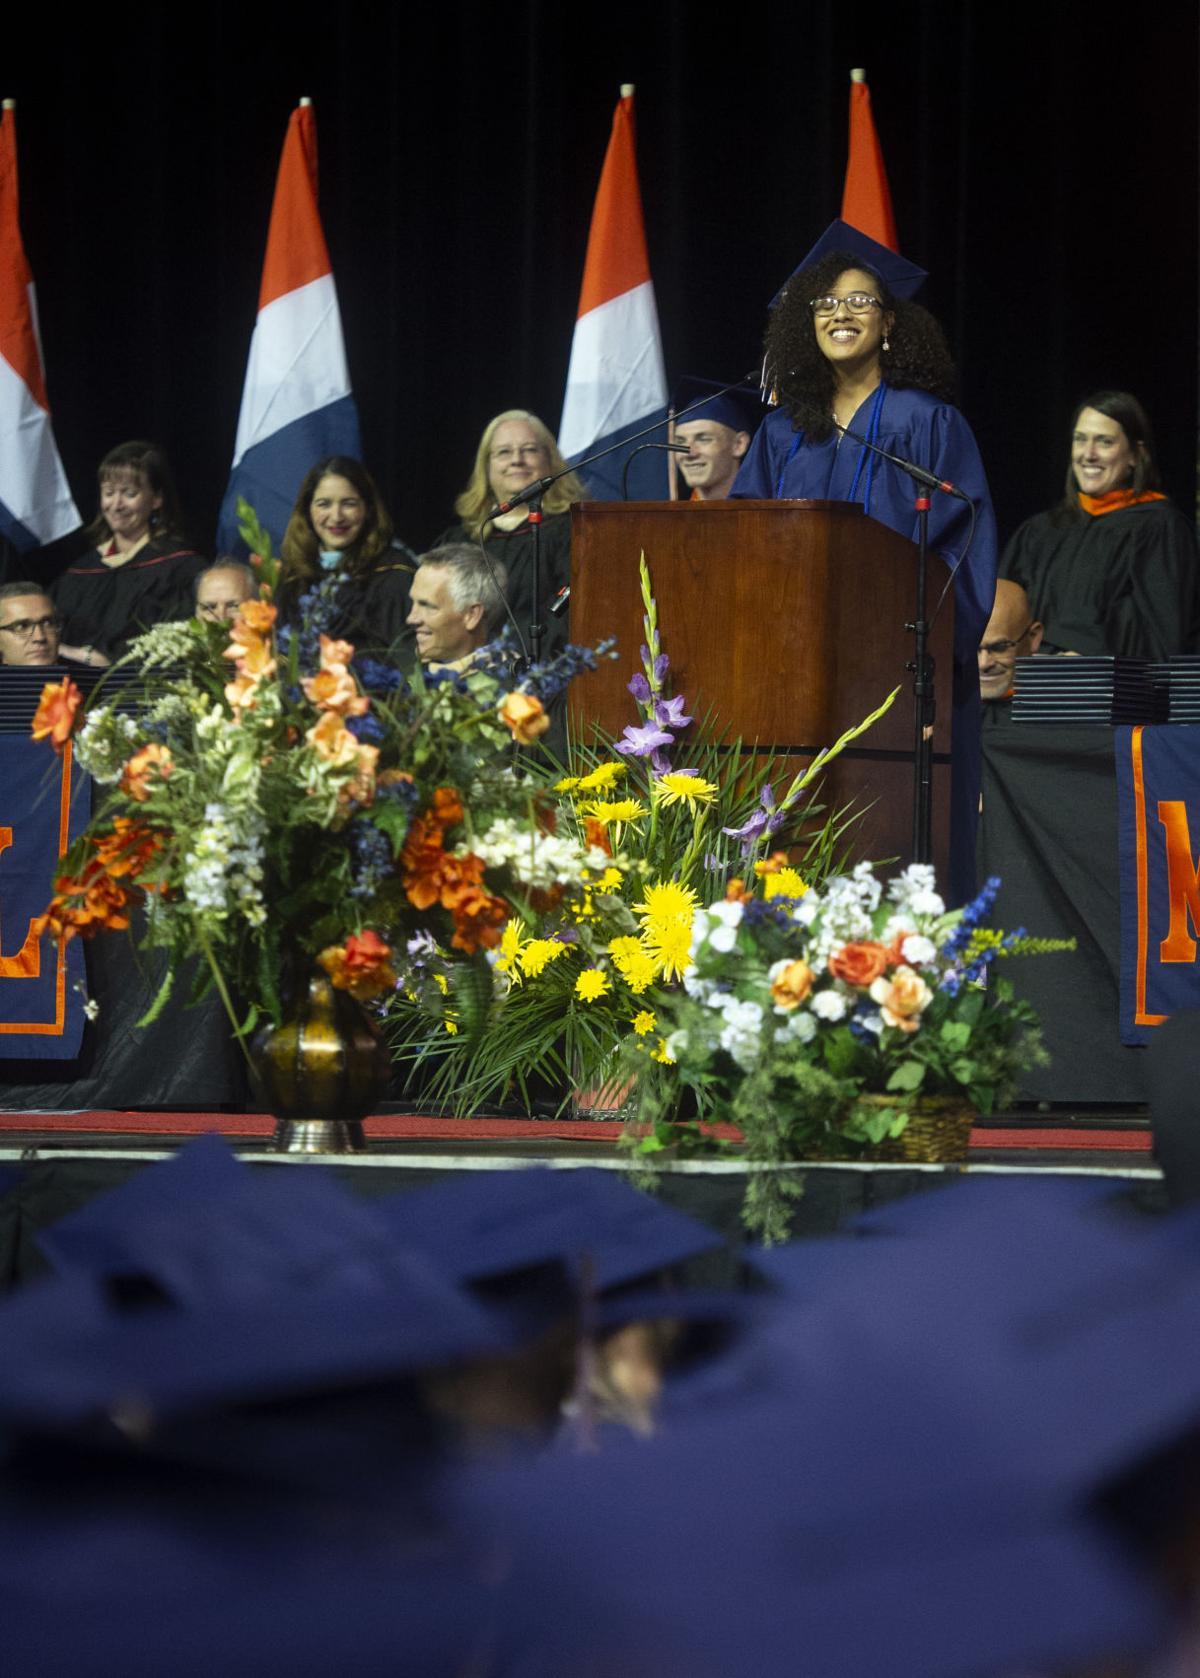 052119-Mitchell High School Graduation 15.jpg